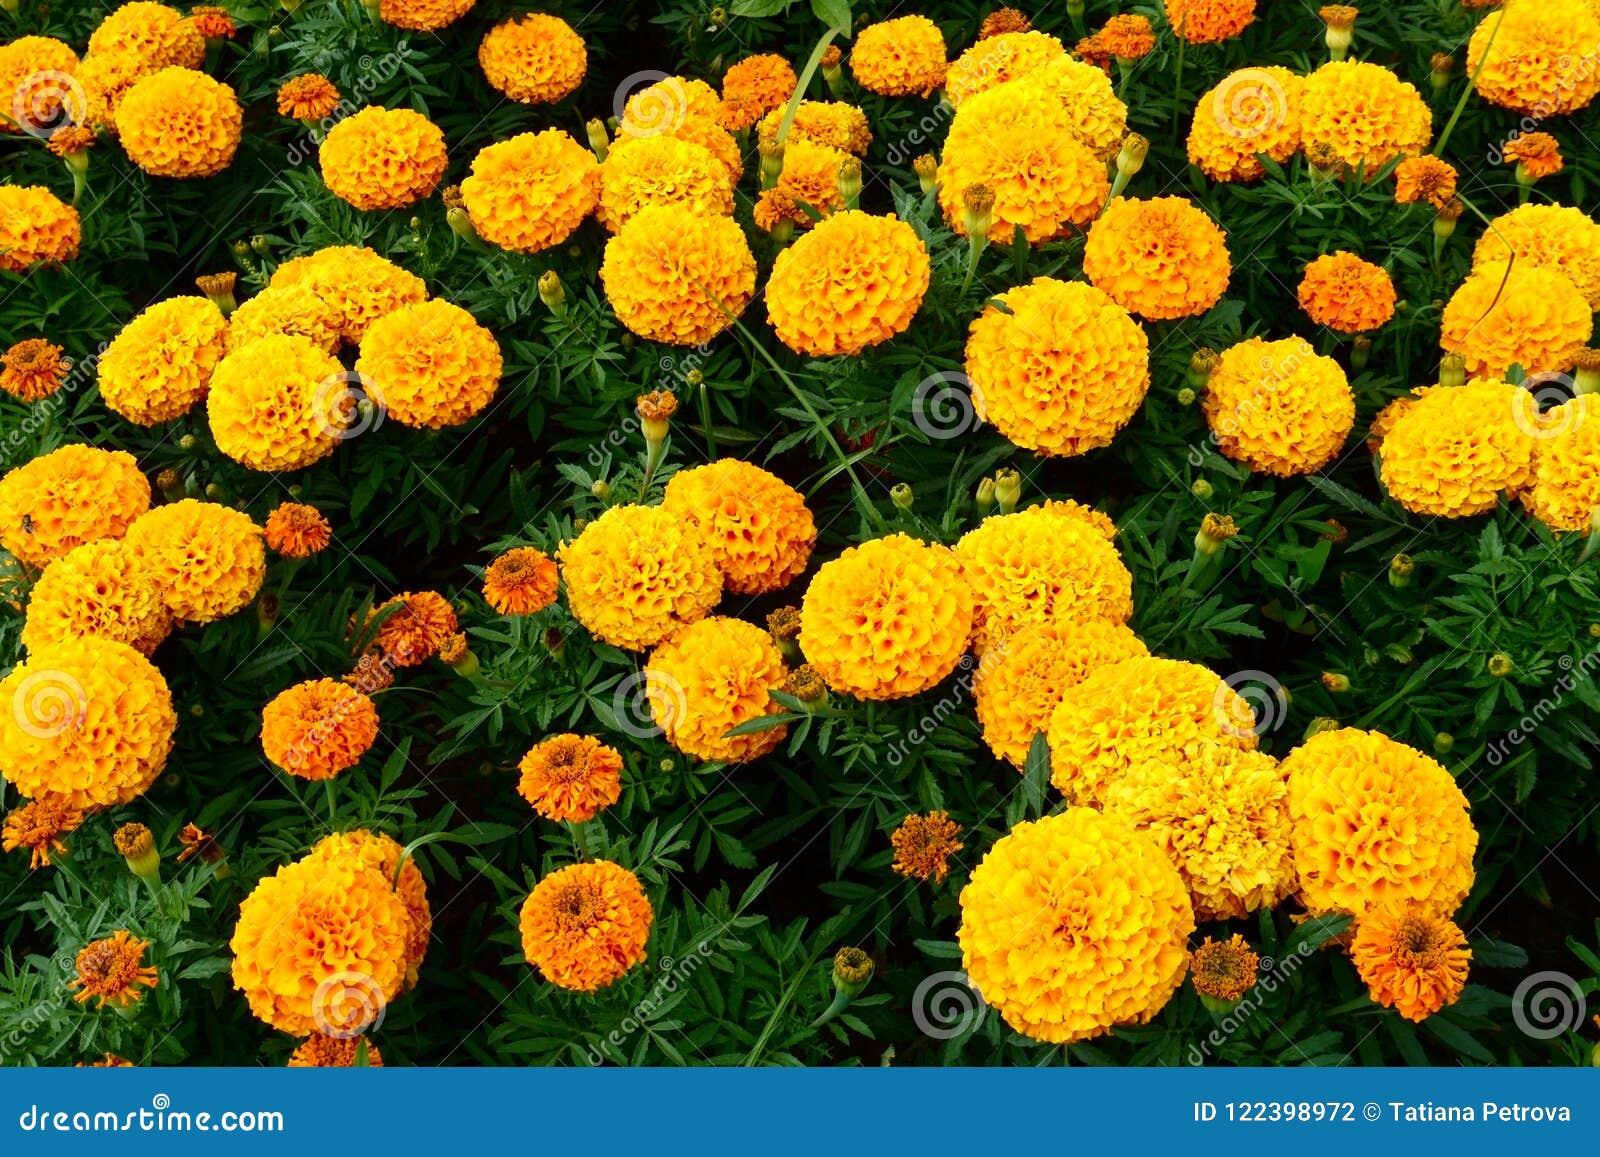 Marigold city flowers on summer yellow beautiful flowers nice day download marigold city flowers on summer yellow beautiful flowers nice day stock photo image izmirmasajfo